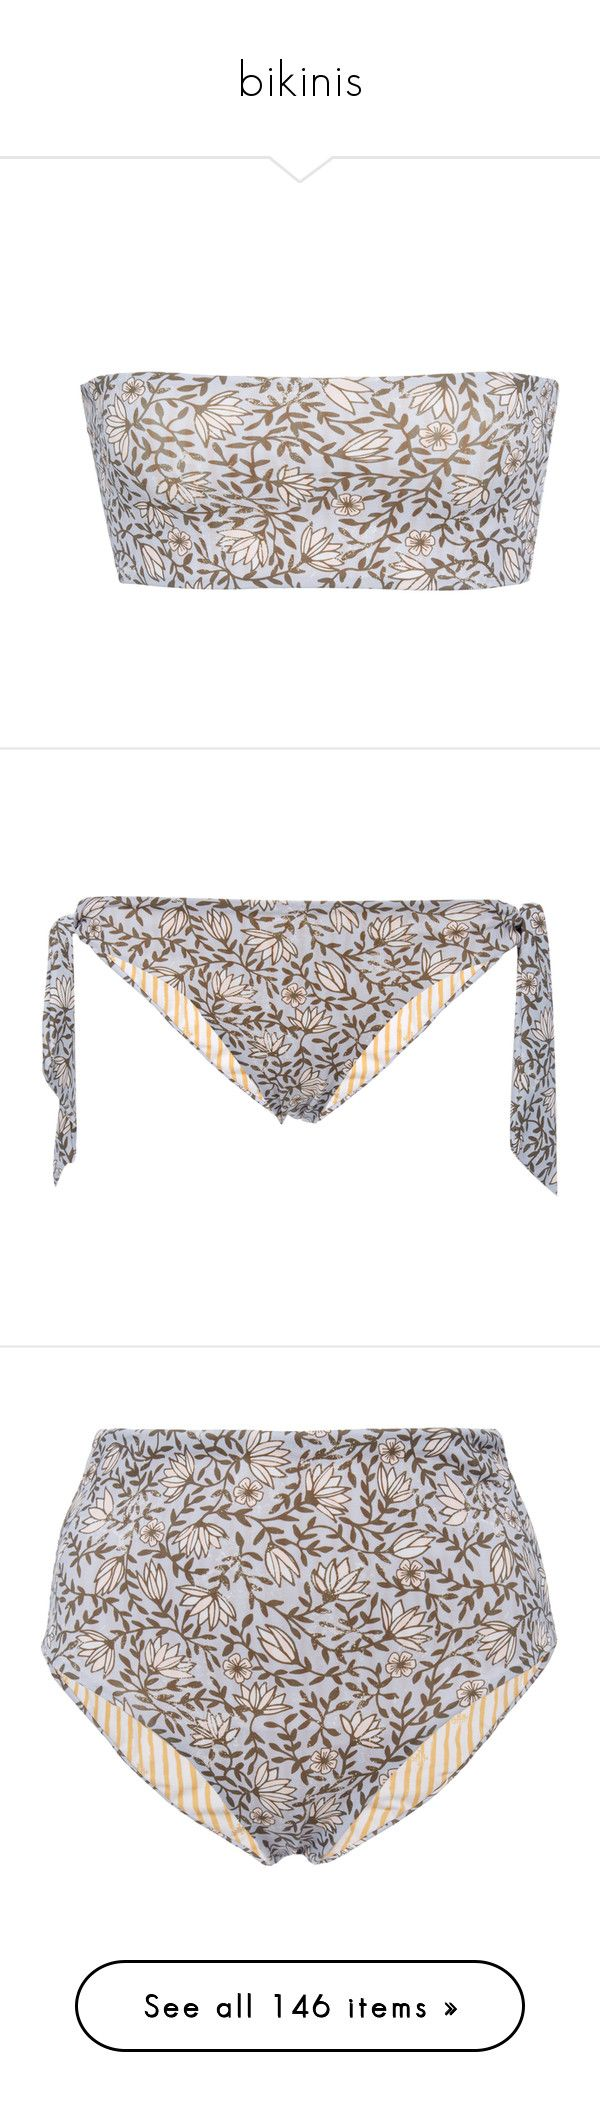 """bikinis"" by soniamoreira ❤ liked on Polyvore featuring swimwear, bikinis, bikini tops, floral, floral strapless bikini, strapless bikini, floral two piece, floral bandeau bikini top, bandeau top bikini and bikini bottoms"